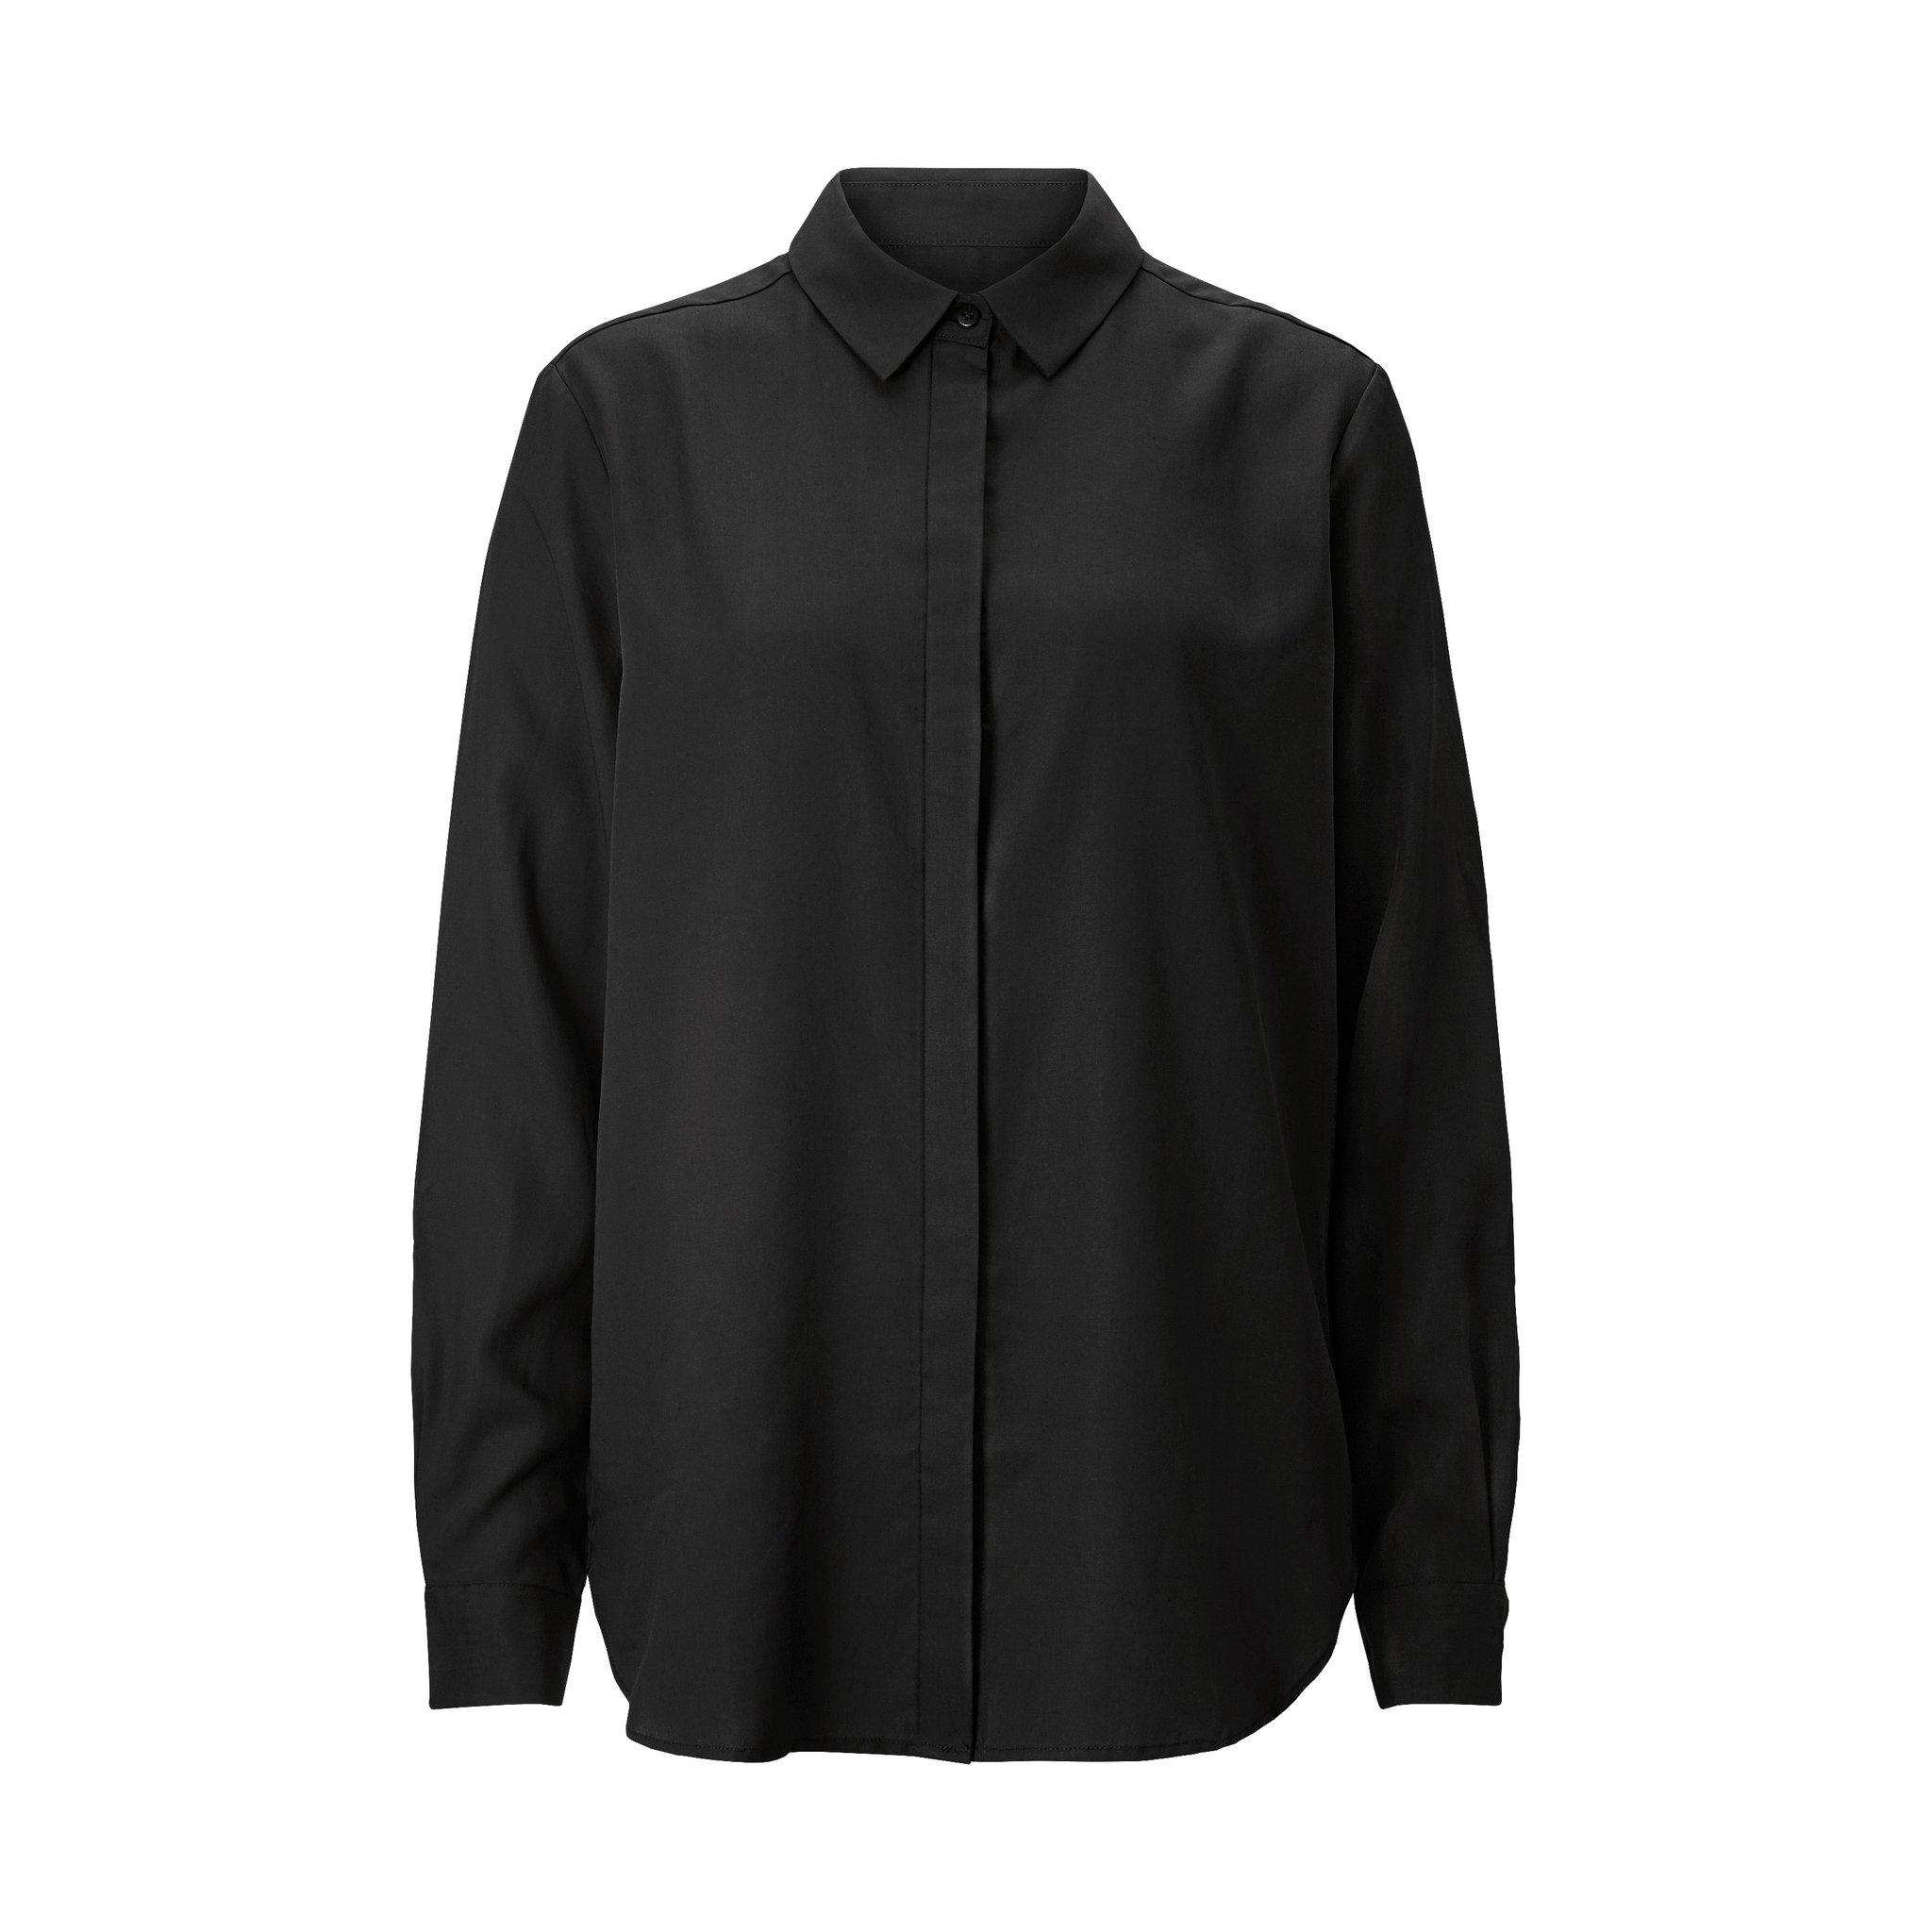 Skjorta Omega - Blusar   skjortor - Köp online på åhlens.se! 19b2d53035068